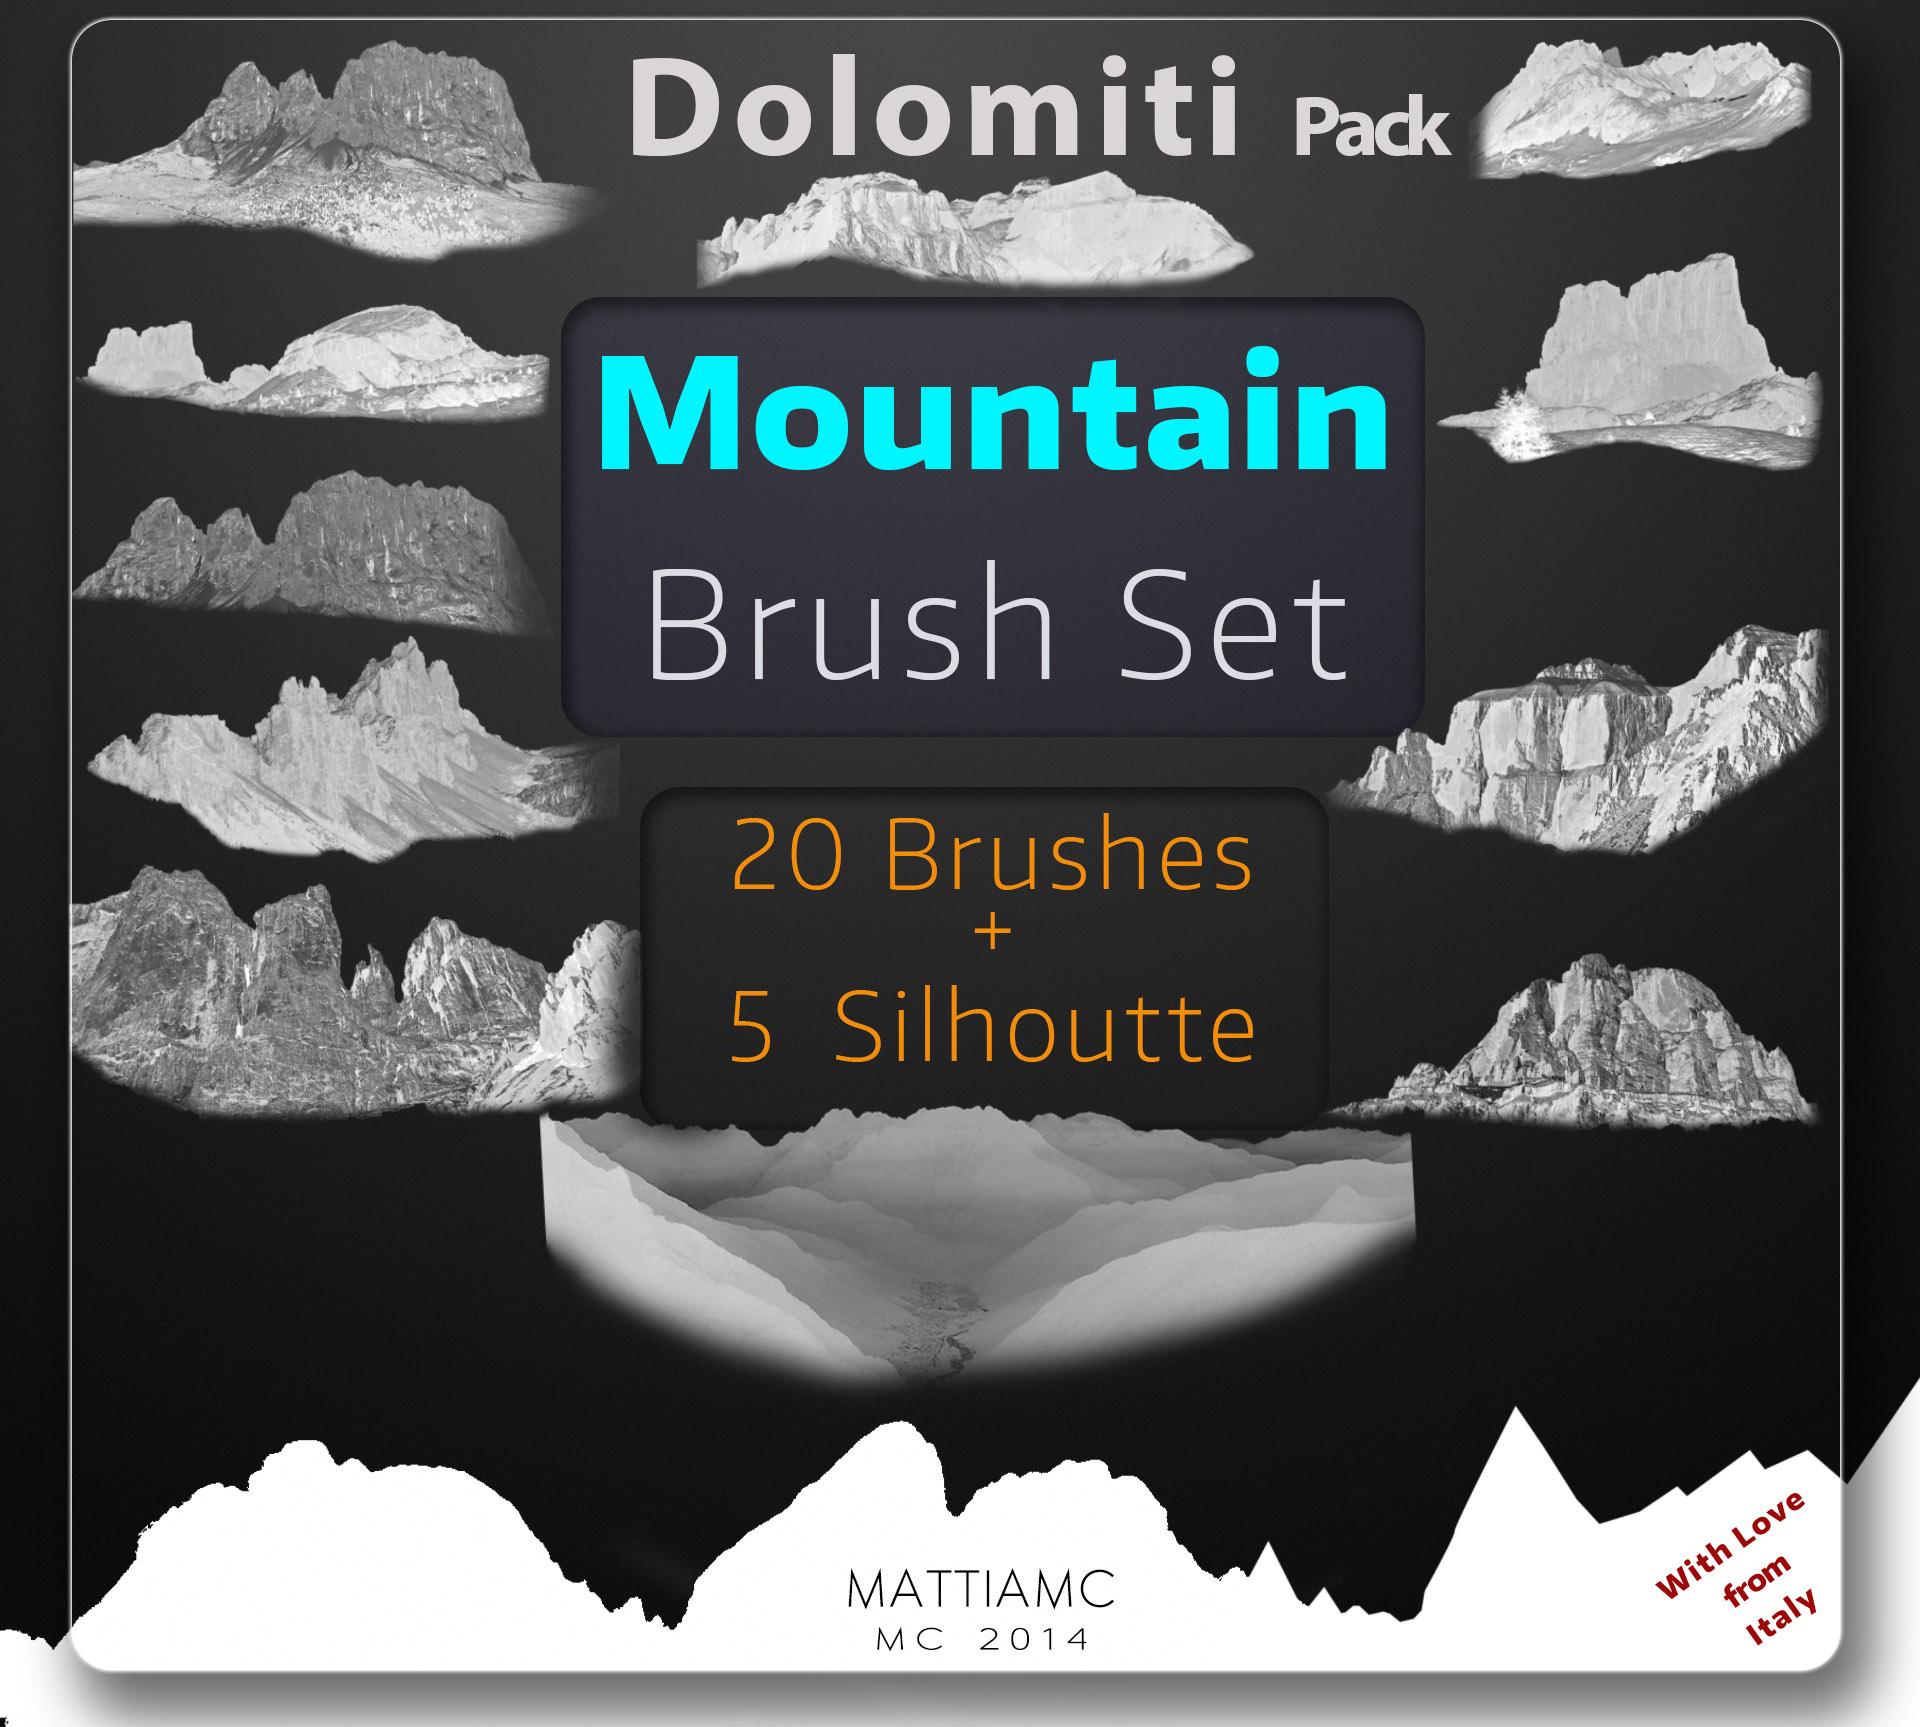 Mountain Brush Set Pack - Dolomiti 25 Brushes